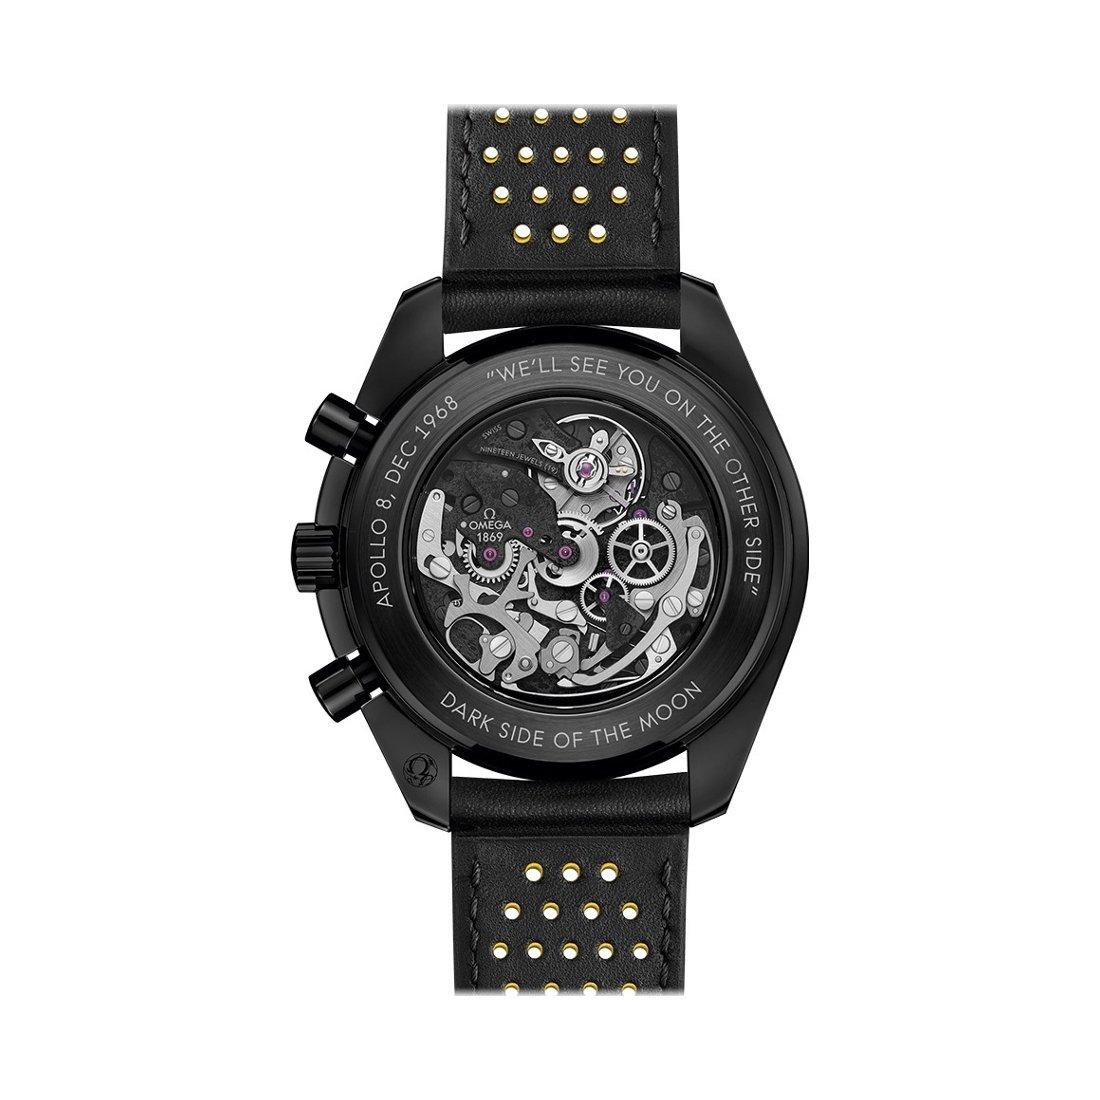 Montre Omega Speedmaster Moonwatch Dark Side of the Moon Apollo 8 Chronographe 44.25mm vue 2